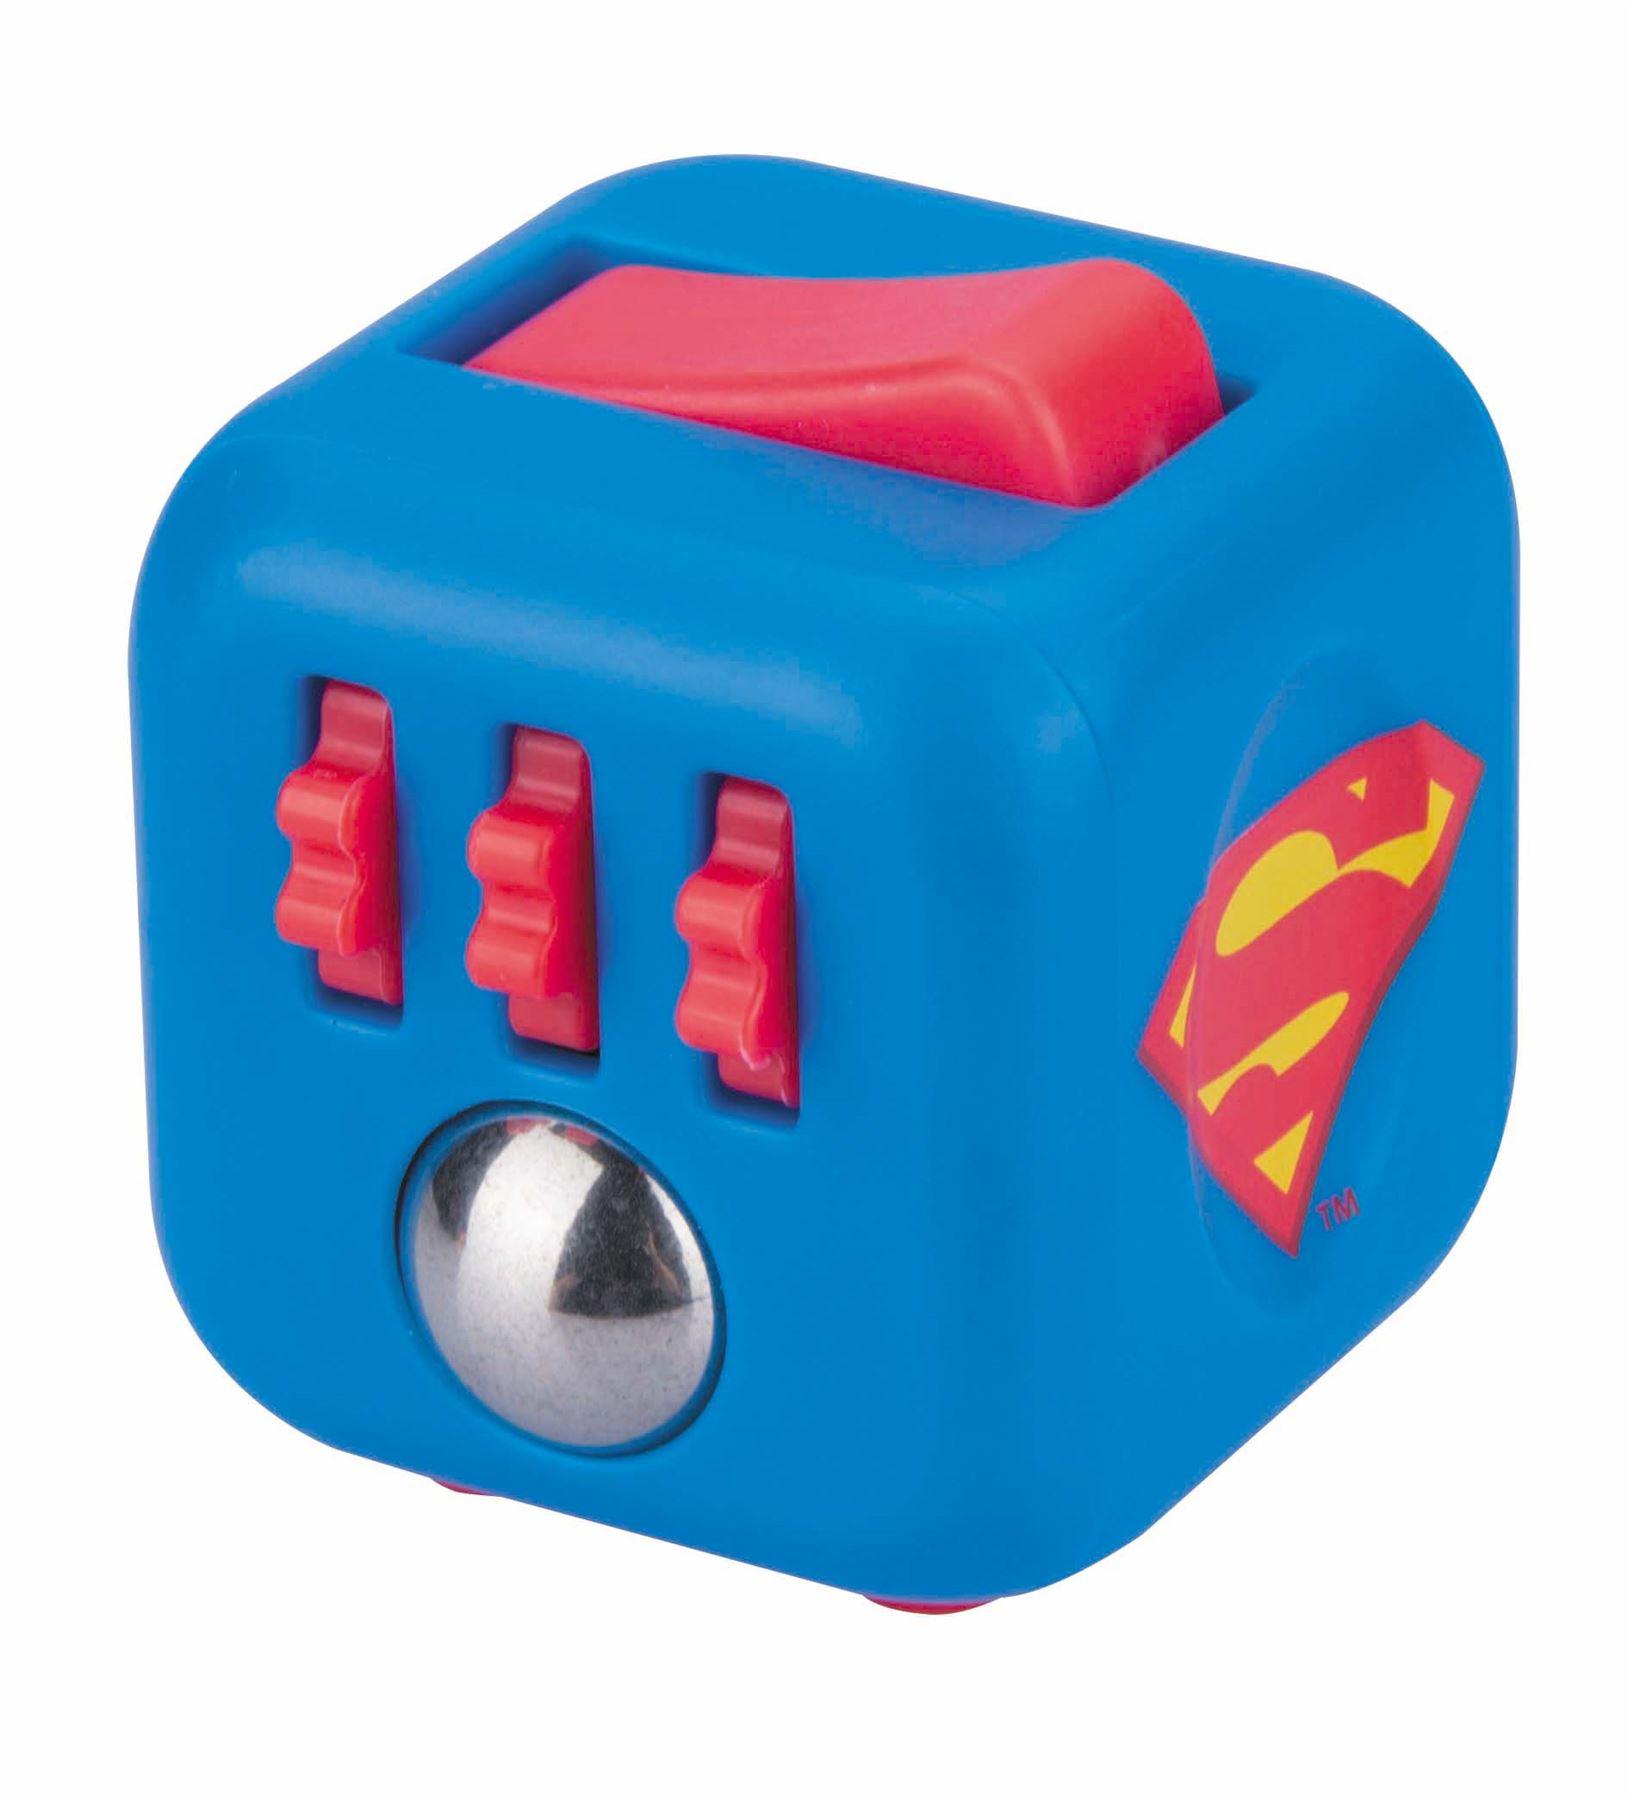 ficial DC ics Zuru Fid Cube Toy Kids Desk Adult Stress